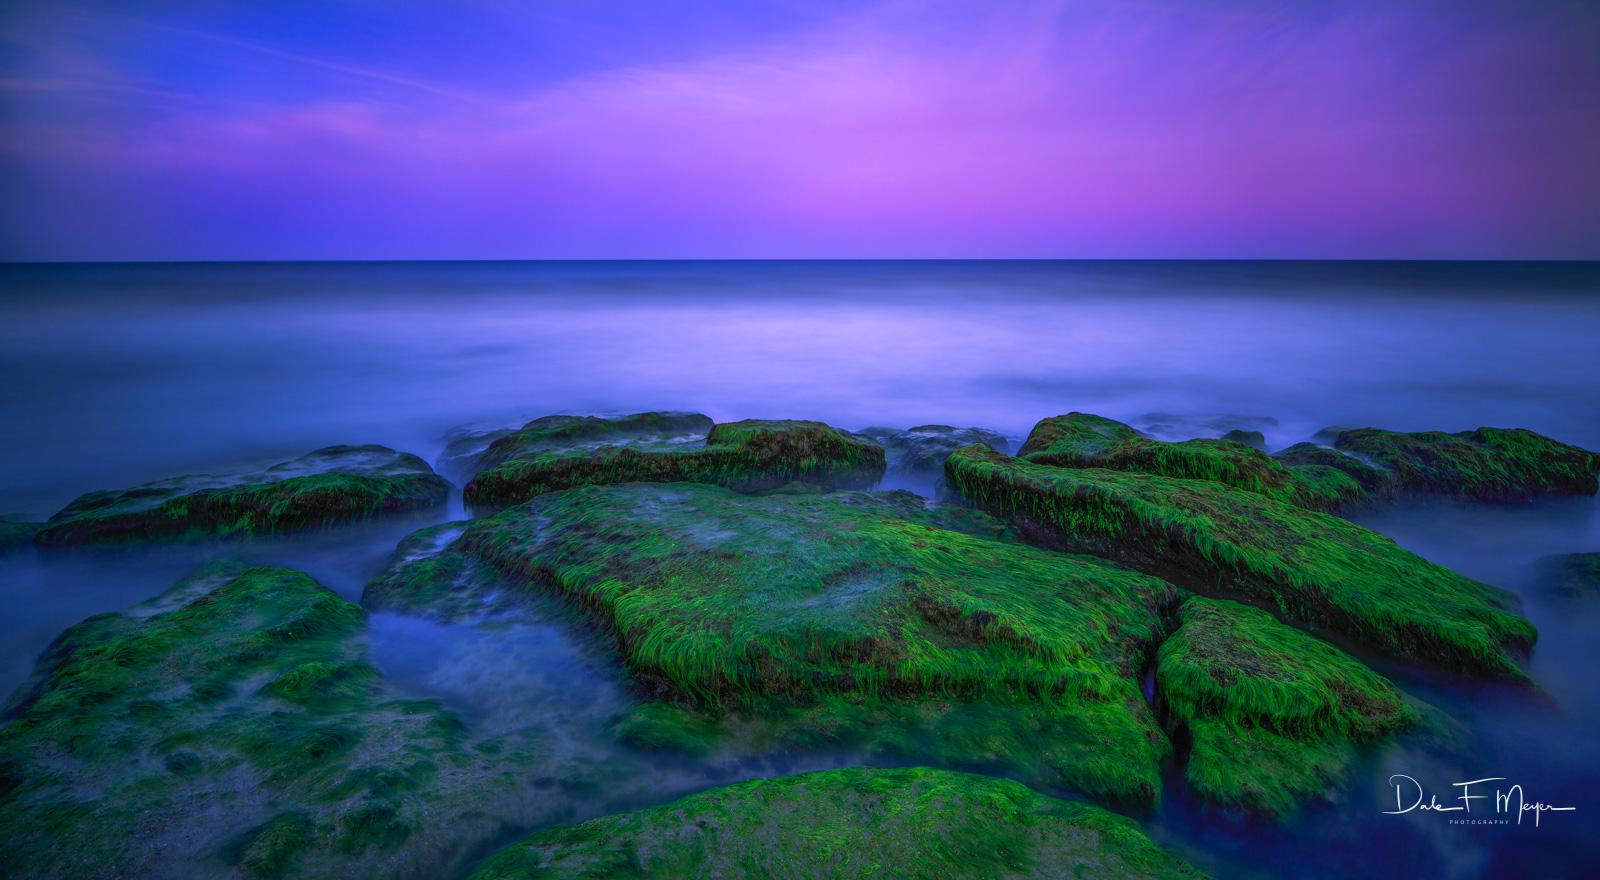 coastal, Coastal Photos of the Eastern Seabord Gallery, Coquina Rocks, Evening Light, long exposure, North Carolina, photo